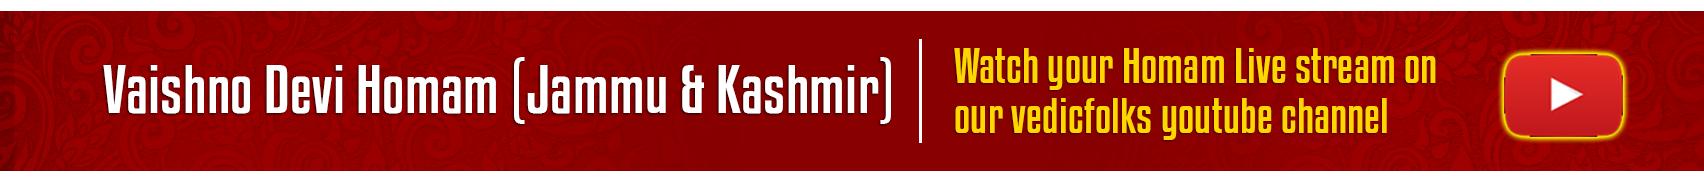 Kashmir Vaishno Devi Homam Youtube link